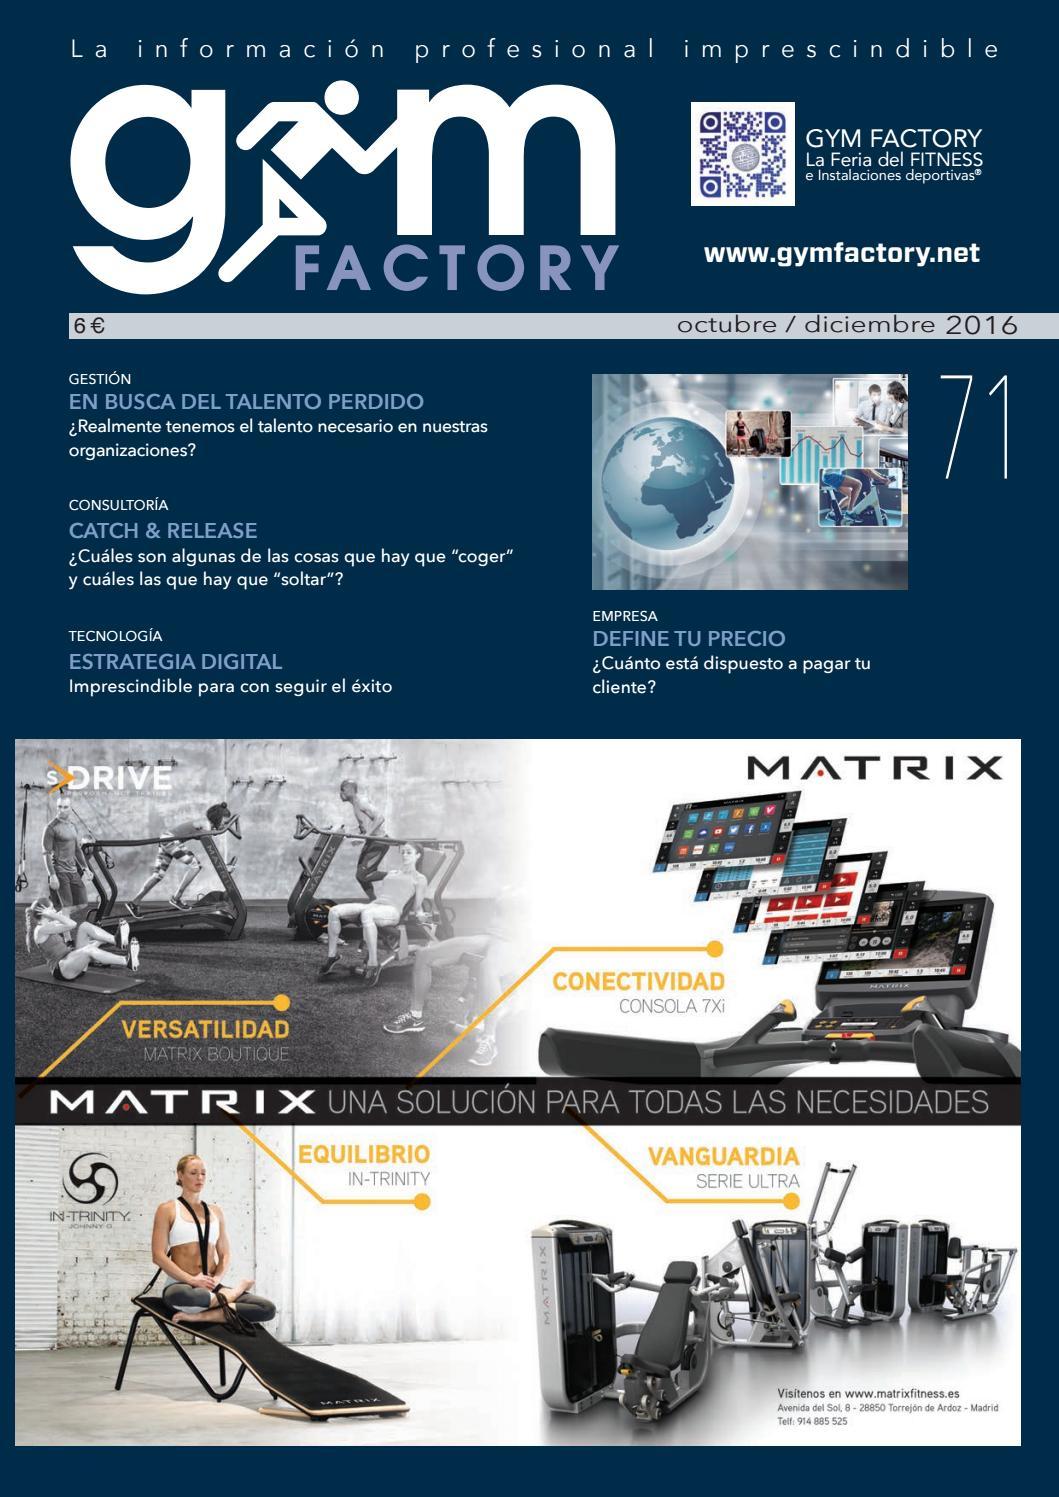 GYM FACTORY Gestión 71 by Gym Factory Magazine - issuu 4831f1a87d41